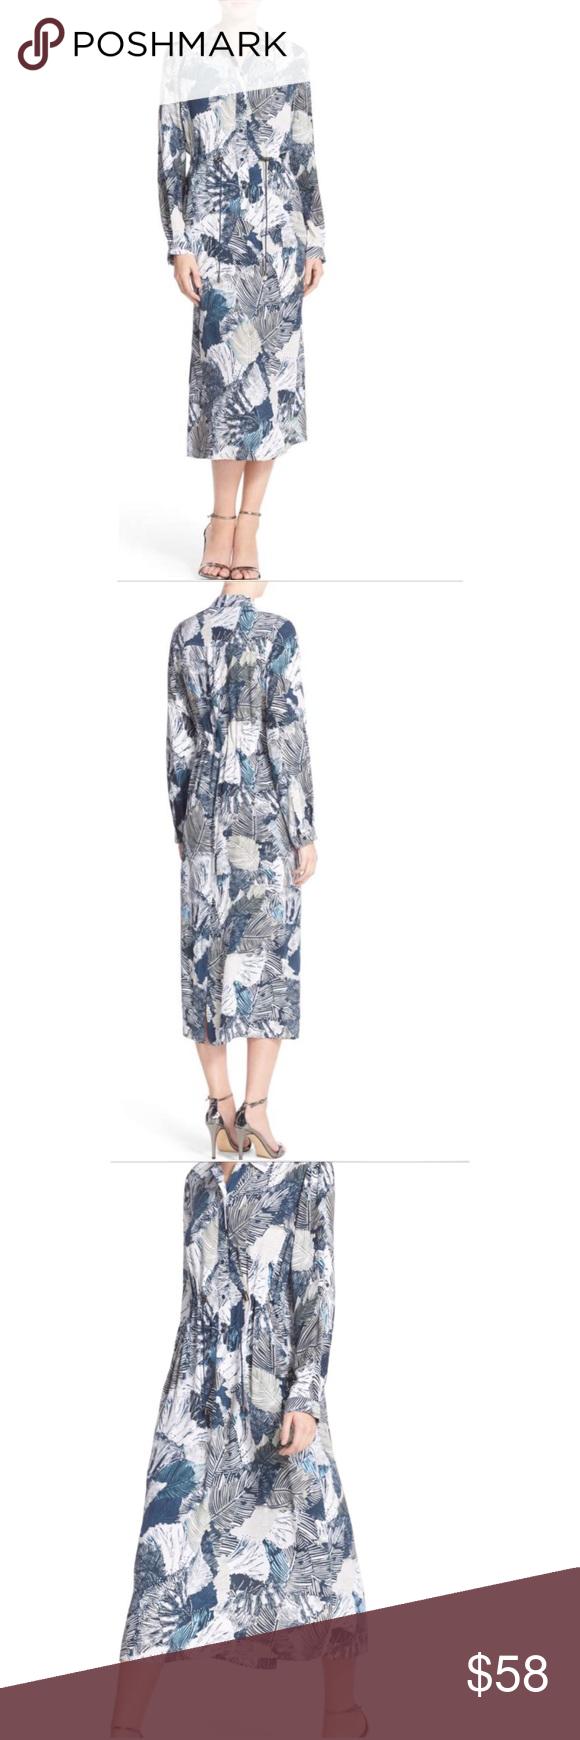 7bd56763621 🆕 French Connection LaLa Palm Print Shirt Dress